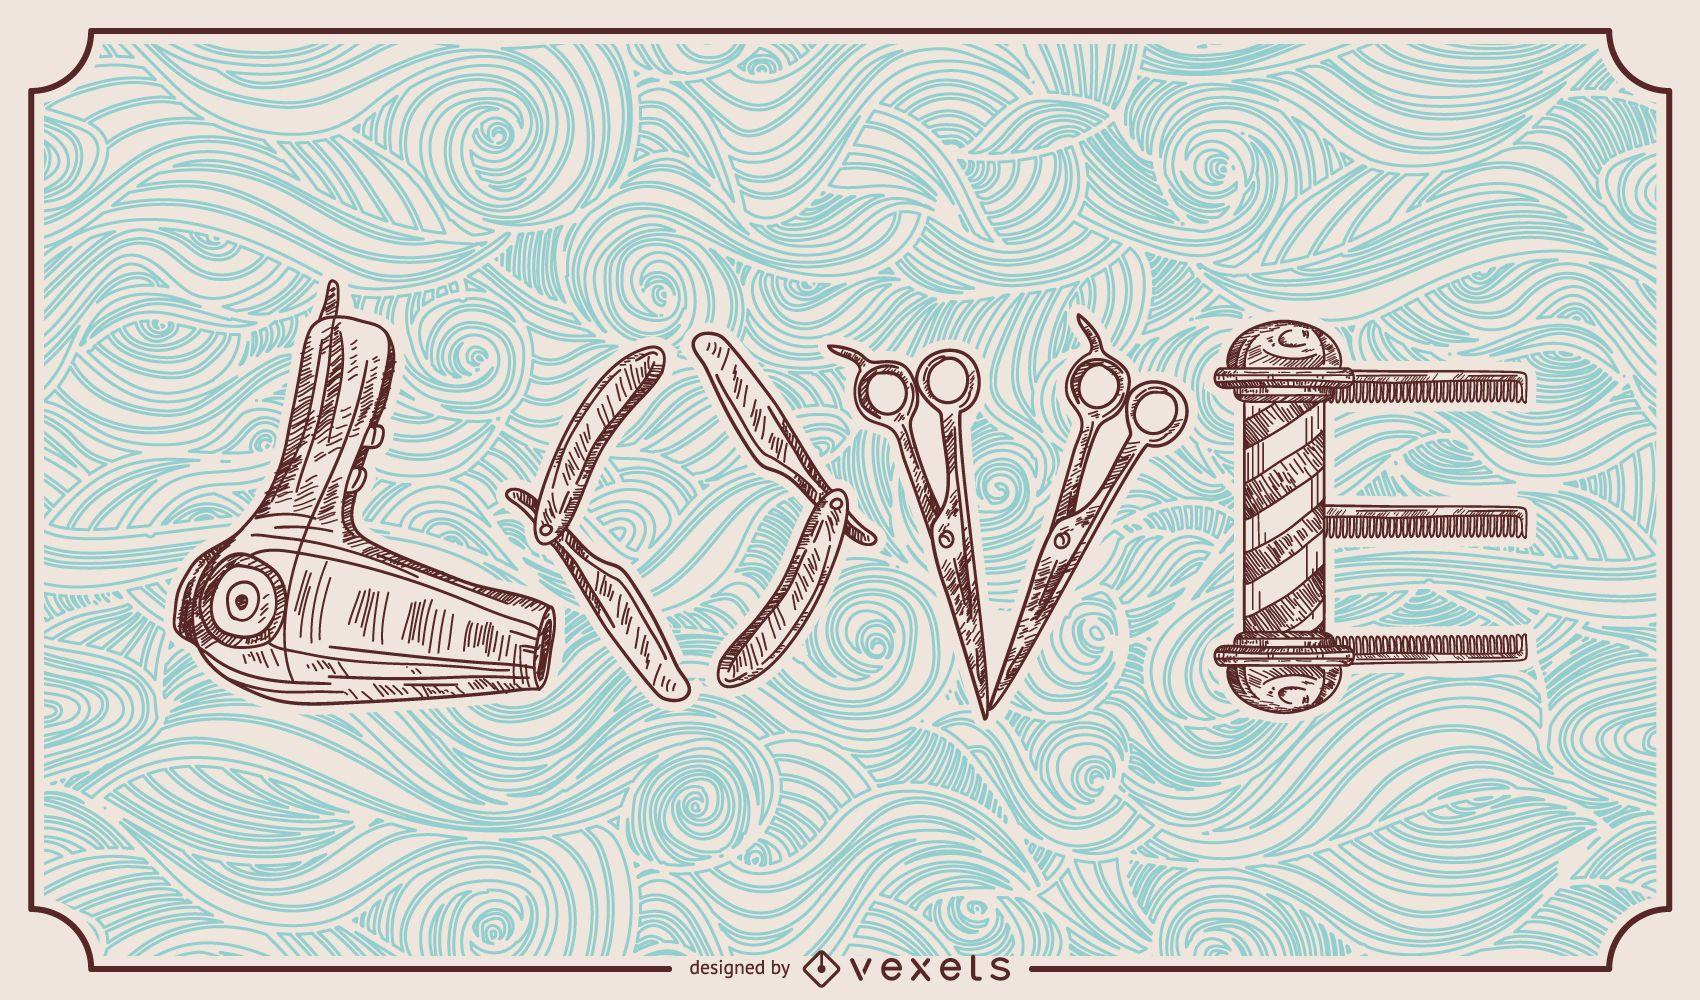 Barber Hairstylist Love Illustration